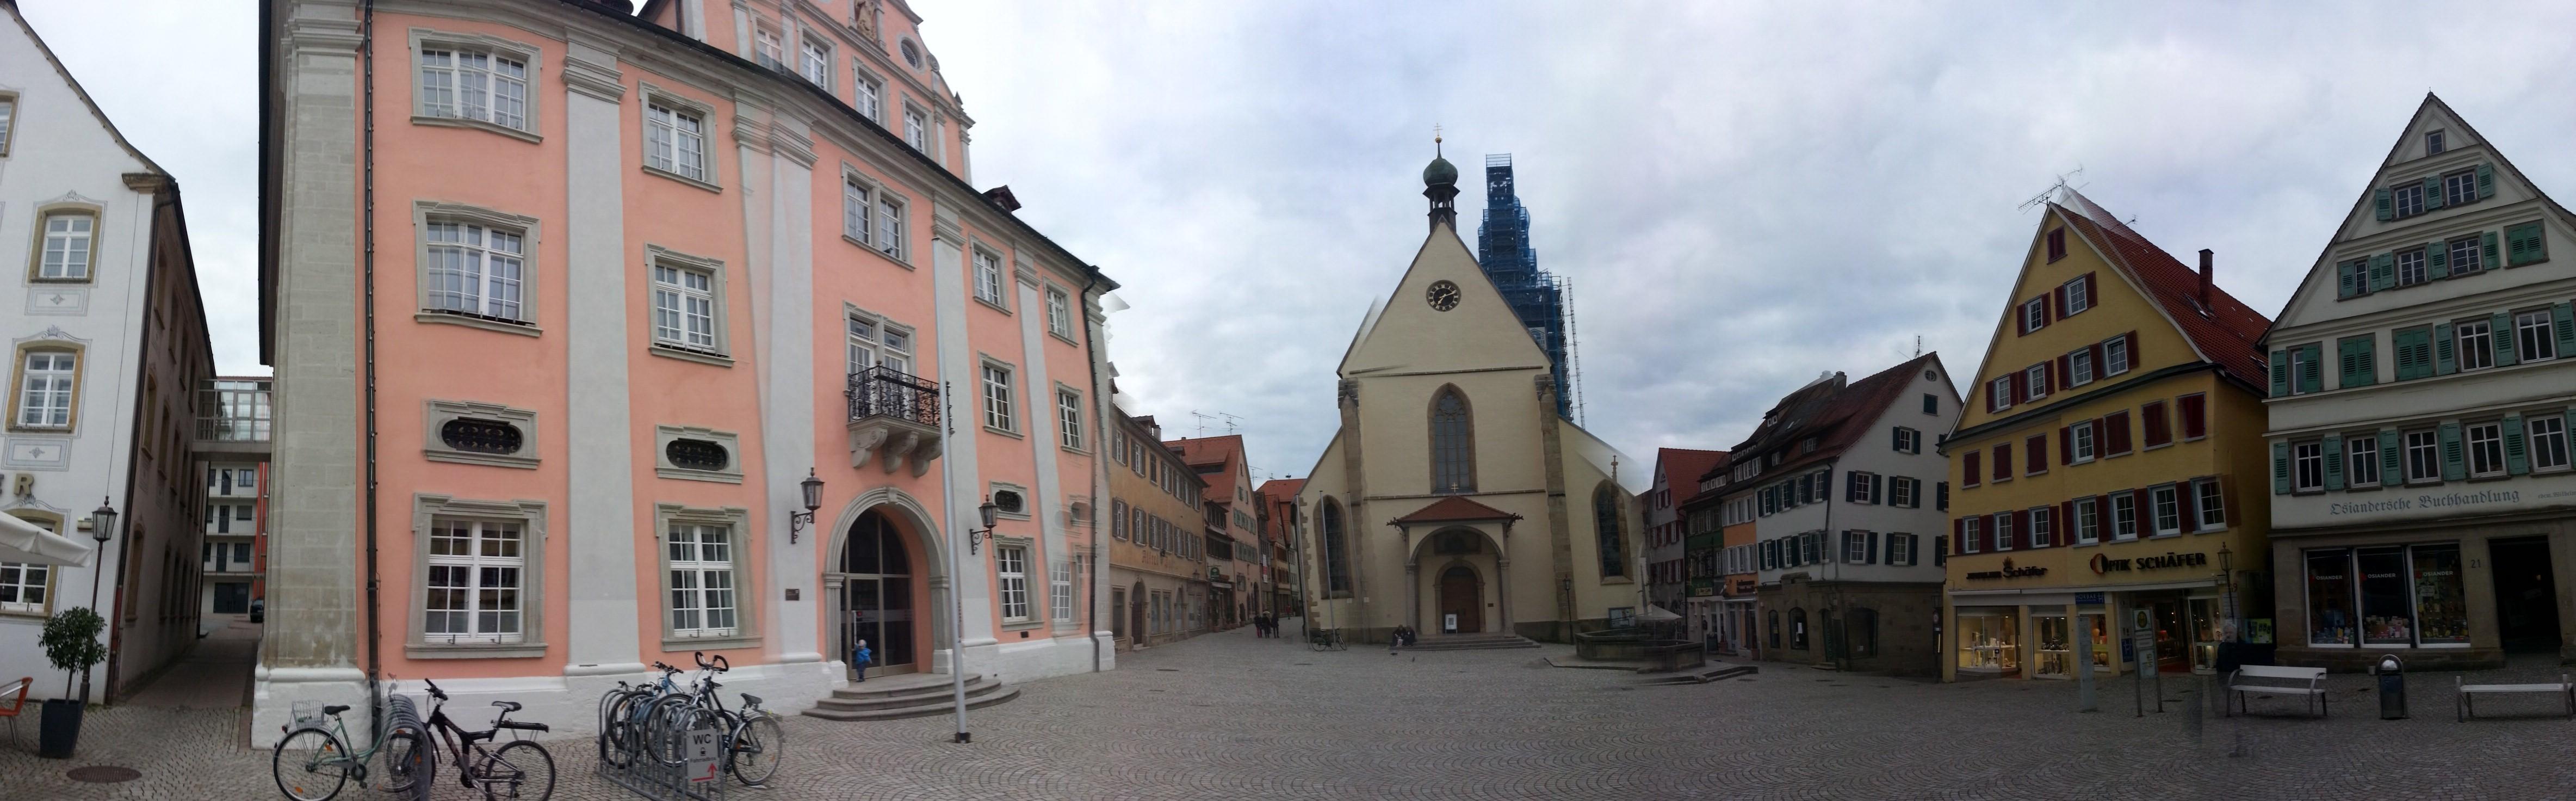 rottburg historic center